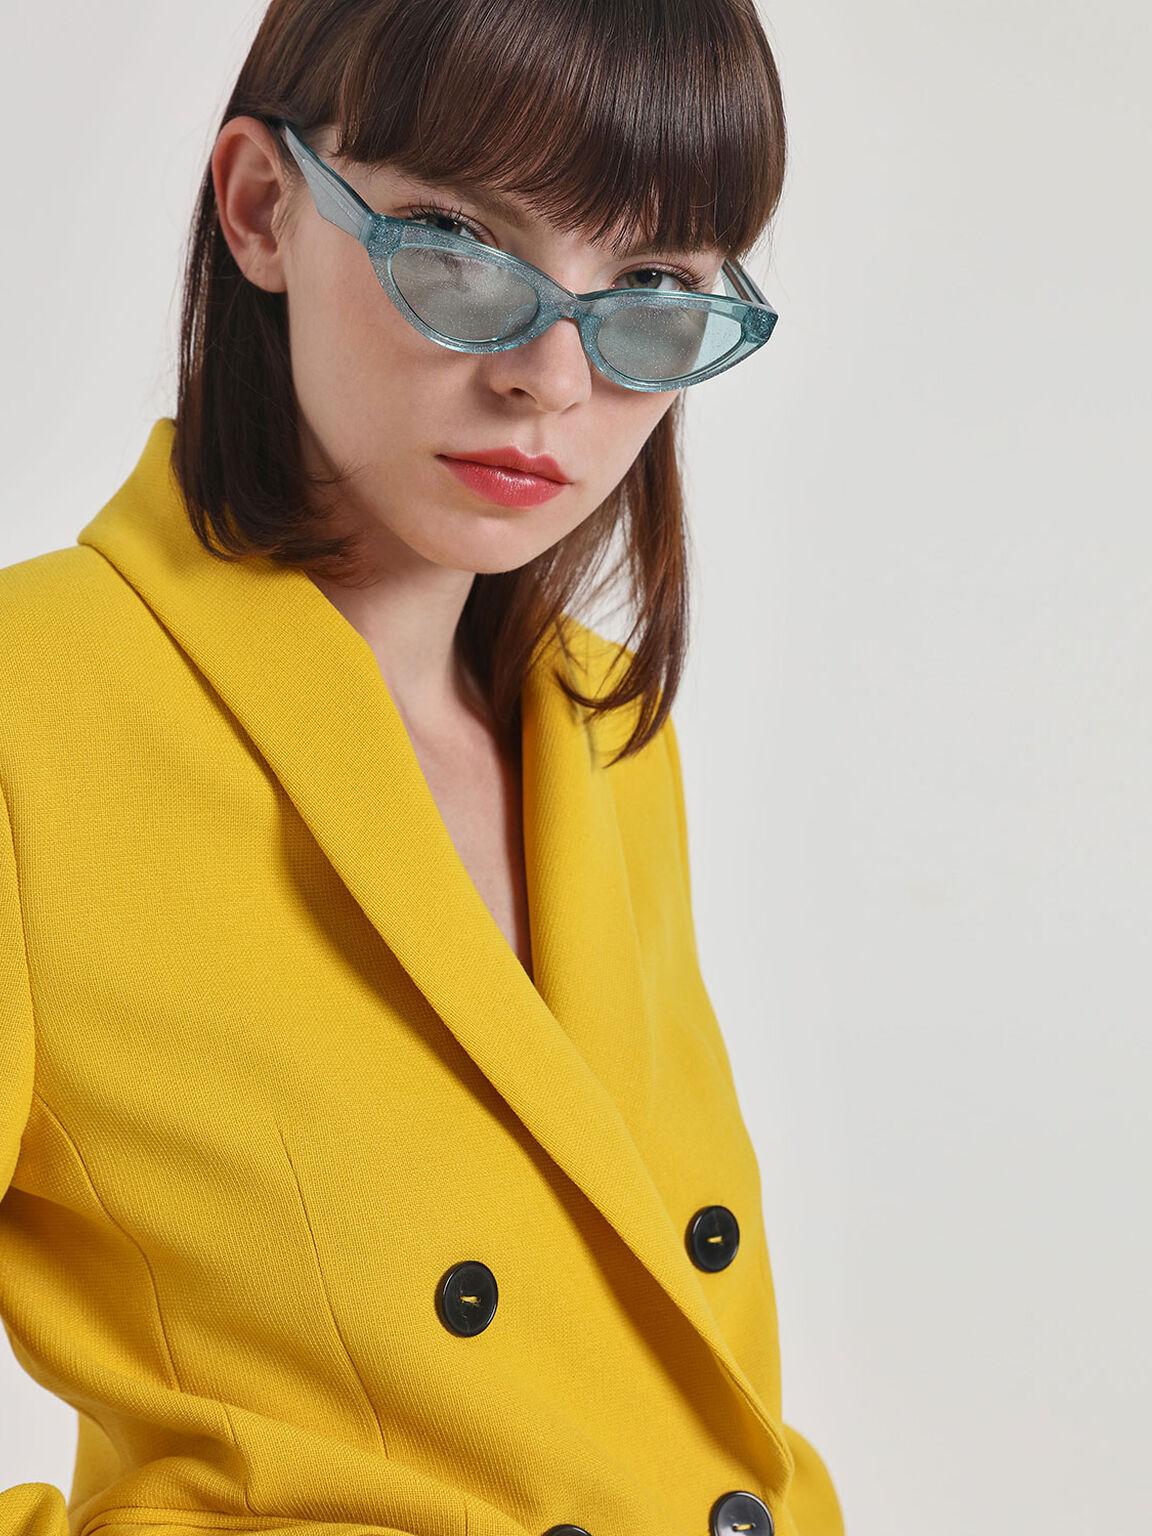 Acetate Oval Frame Sunglasses, Teal, hi-res